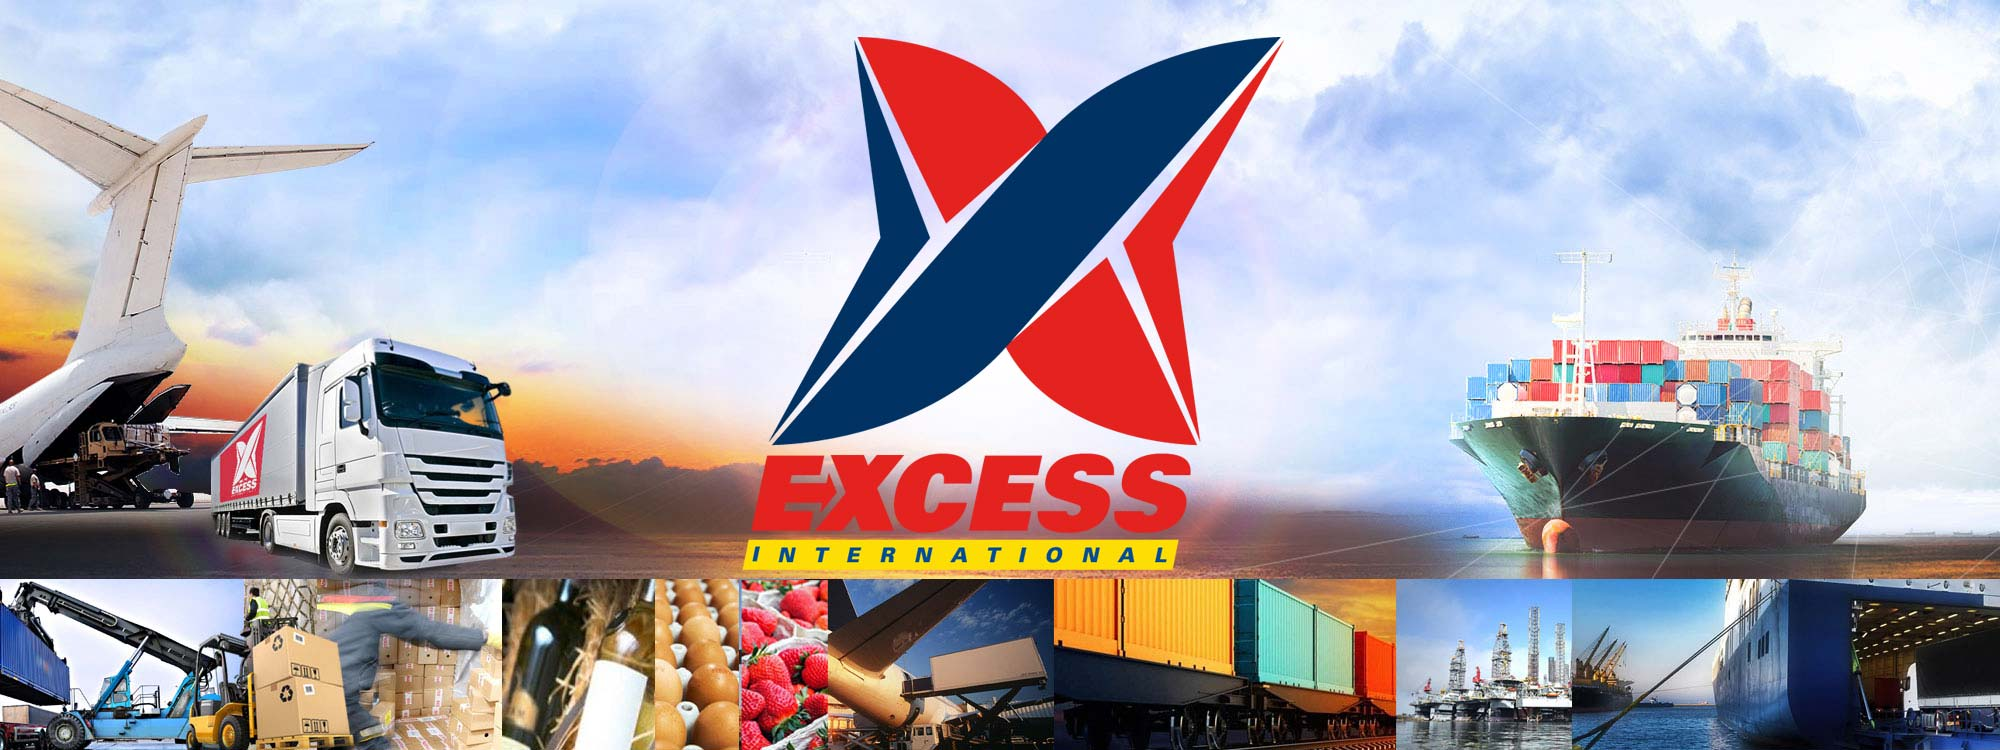 EXCESS INTERNATIONAL / EXPAIR TRANSIT INTL